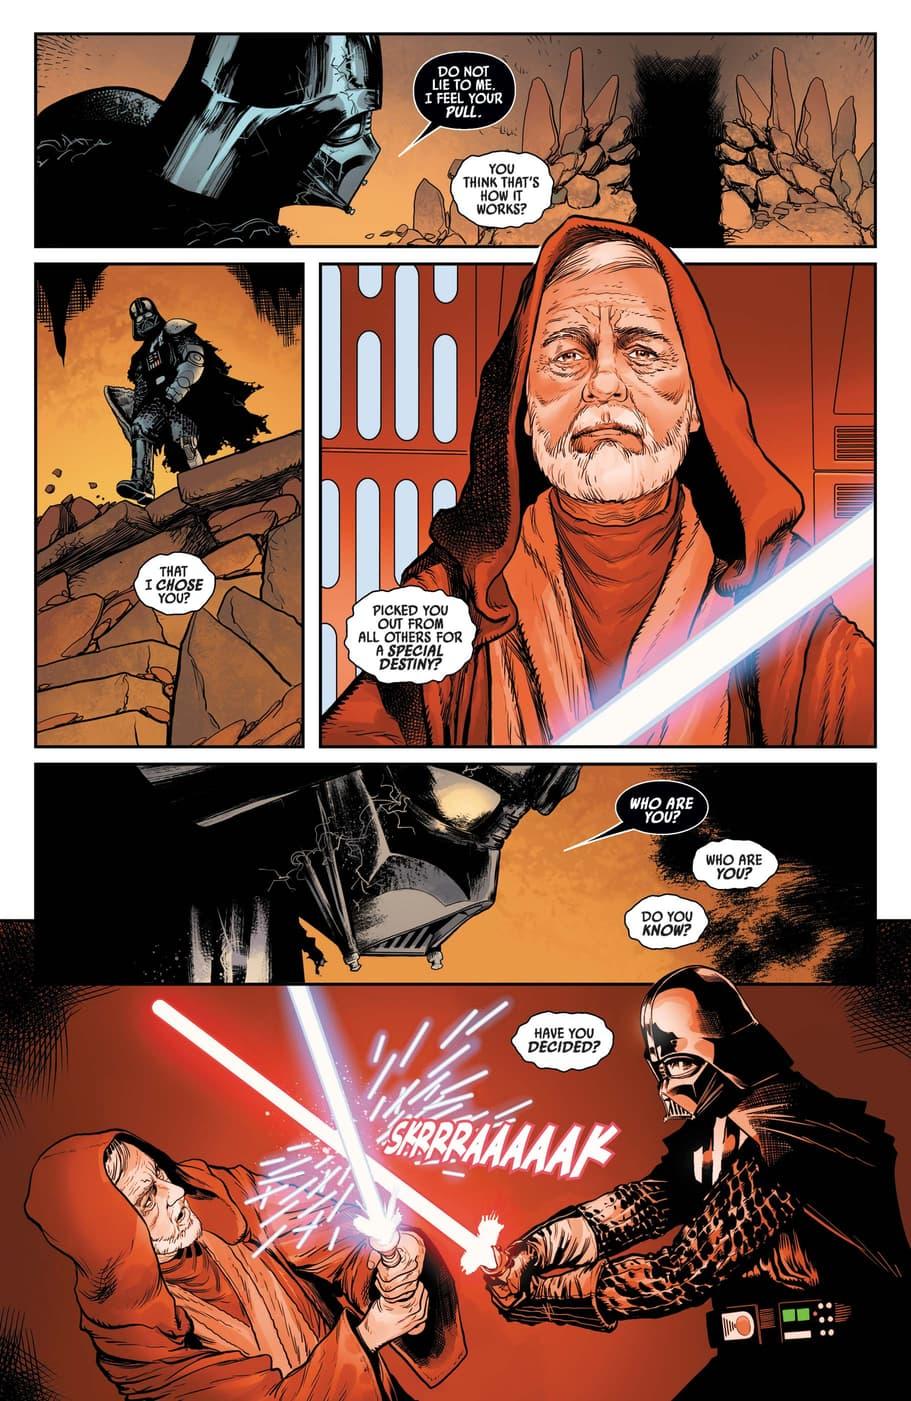 Darth Vader strikes down Obi-Wan Kenobi.